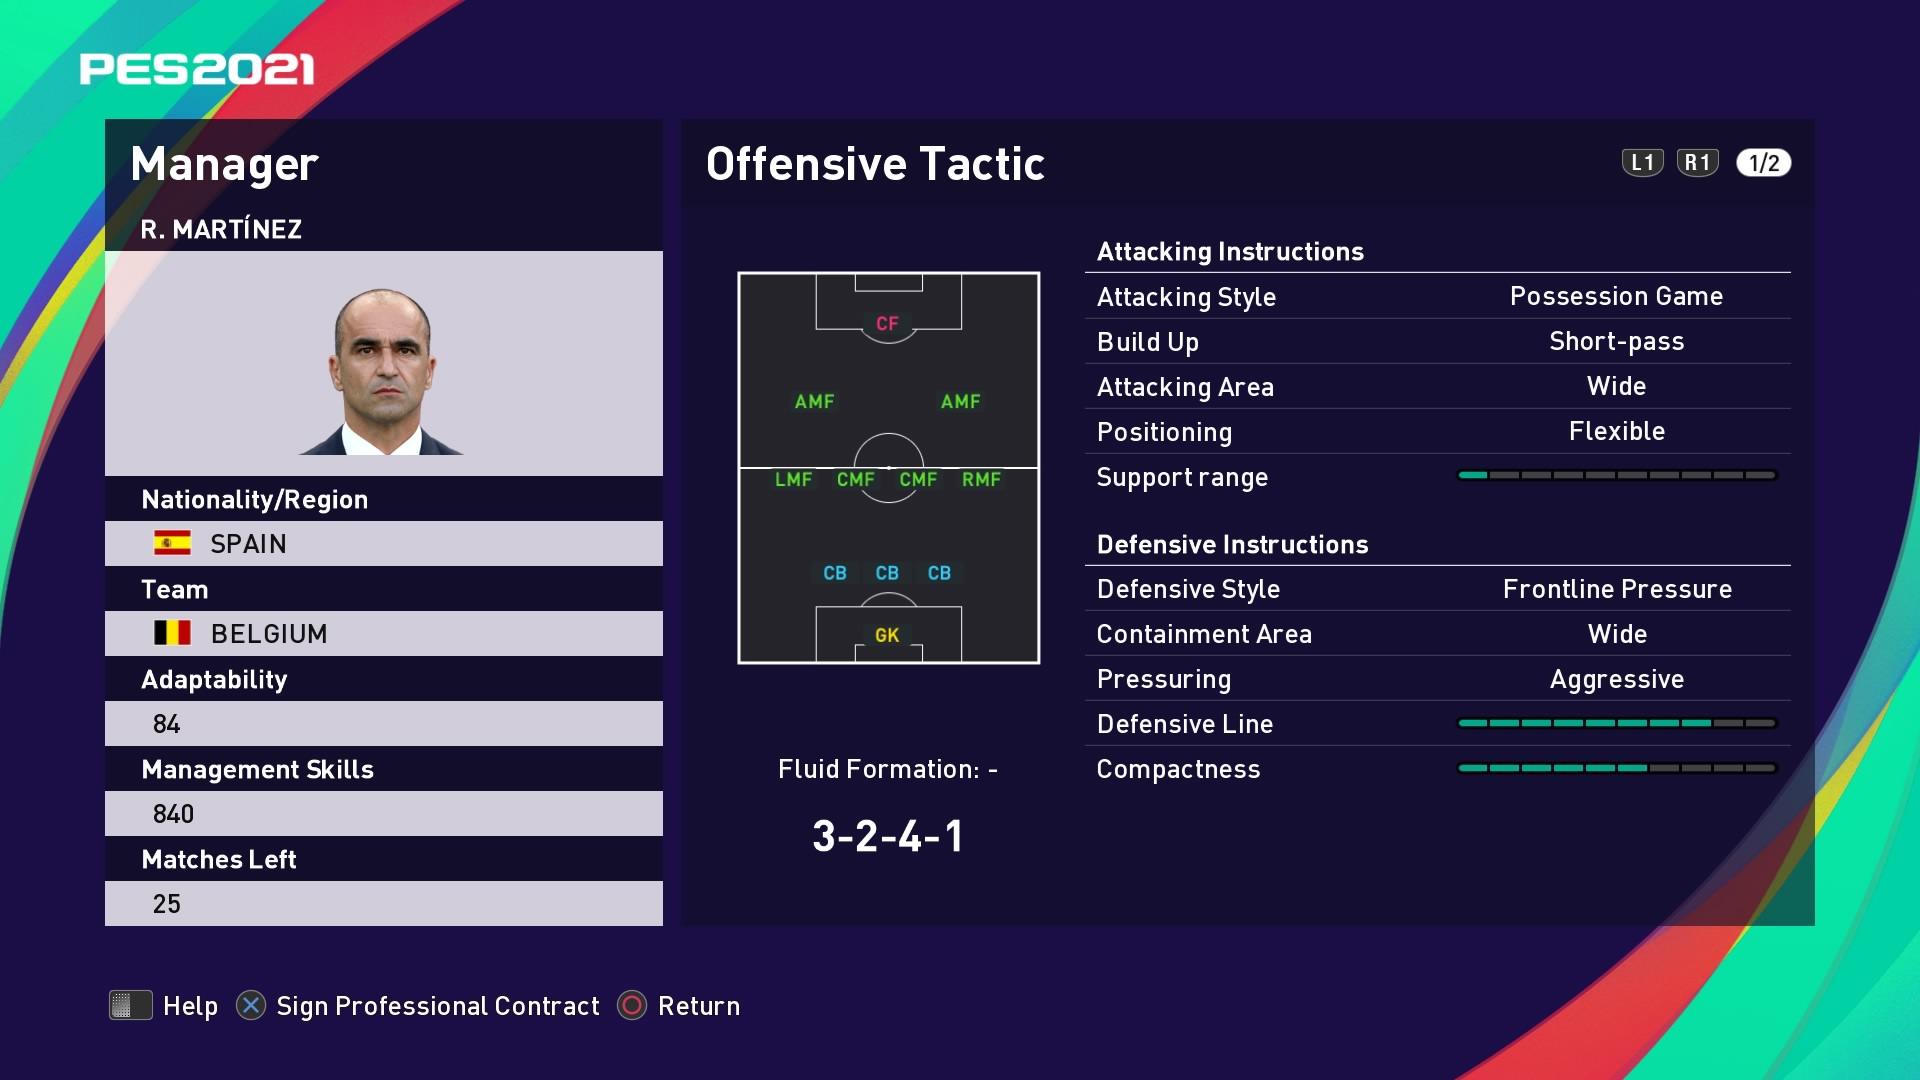 R. Martínez (Roberto Martínez) Offensive Tactic in PES 2021 myClub